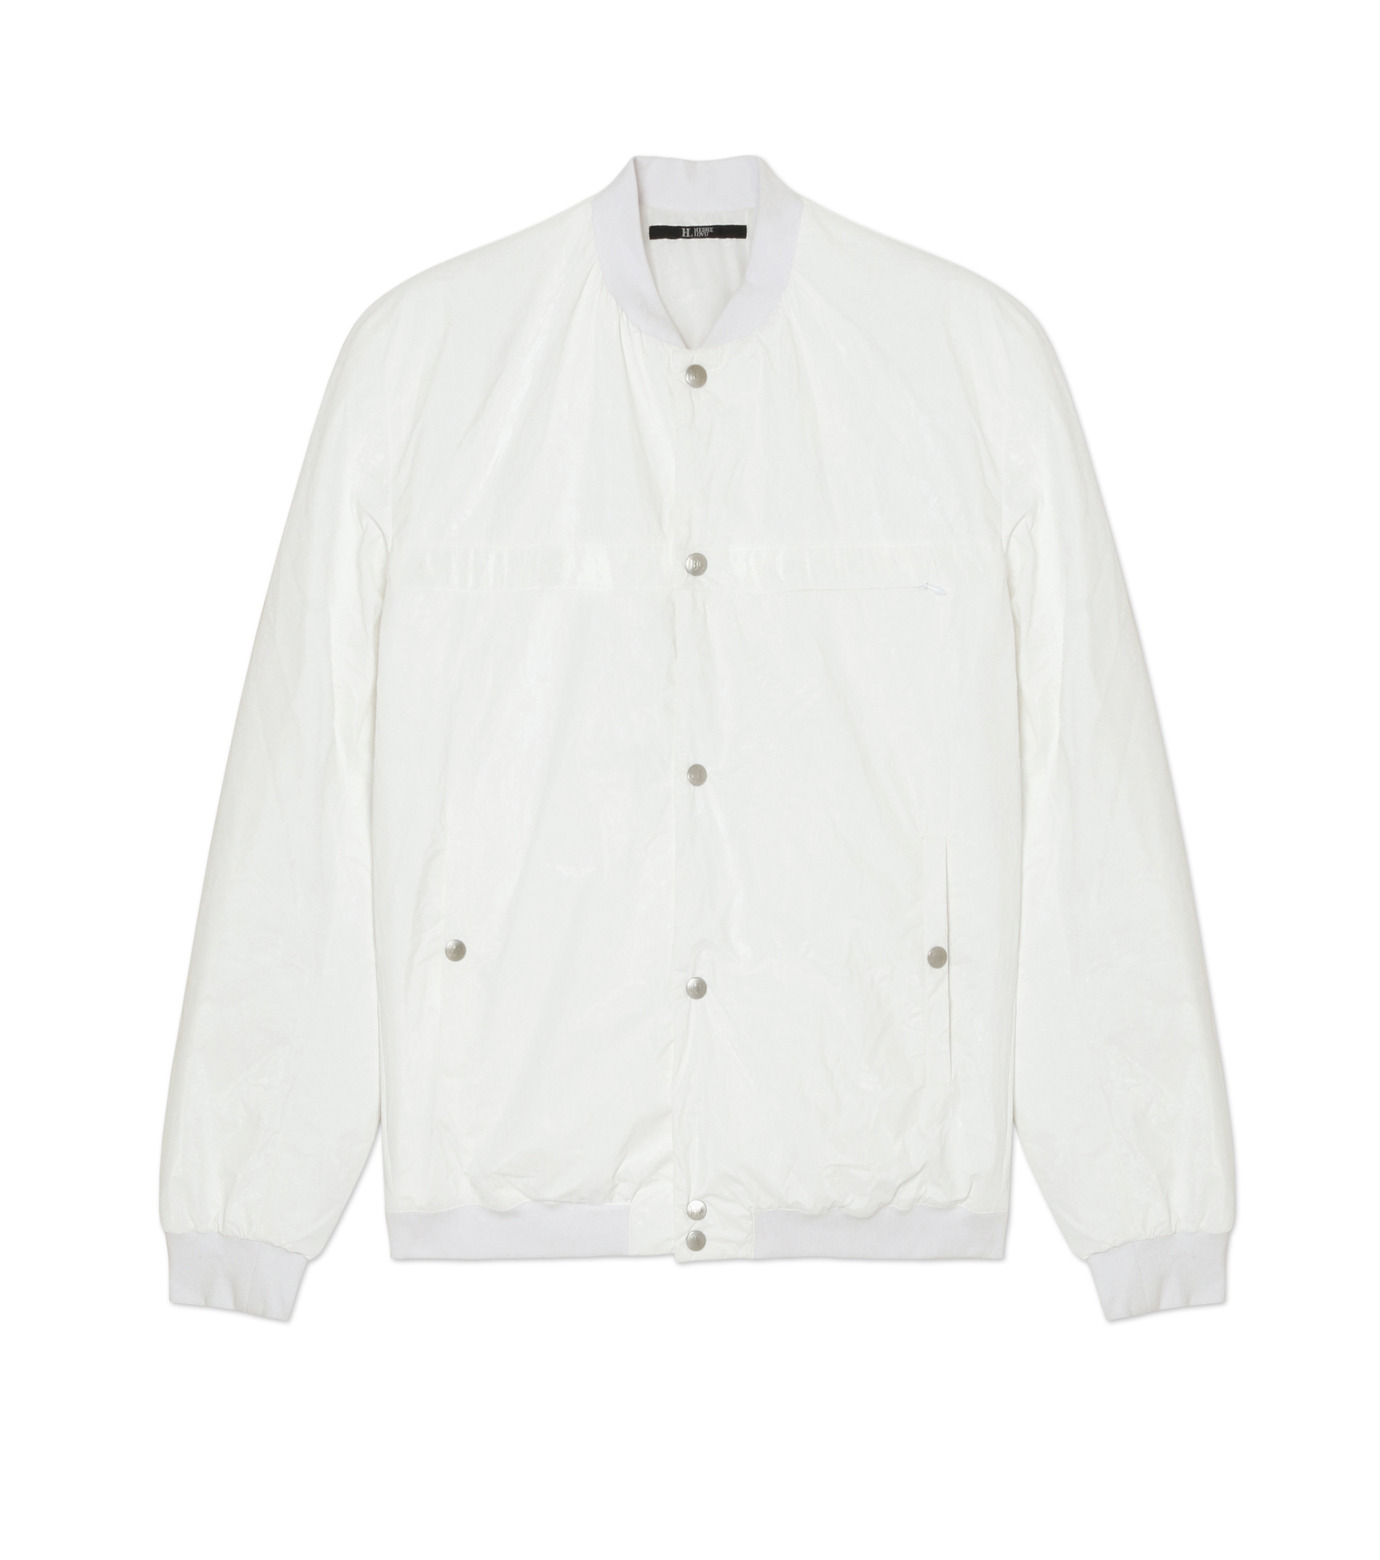 HL HEDDIE LOVU(エイチエル・エディールーヴ)のPAPER RIB COLLAR JACKET-WHITE(ジャケット/jacket)-18A94004-4 拡大詳細画像1